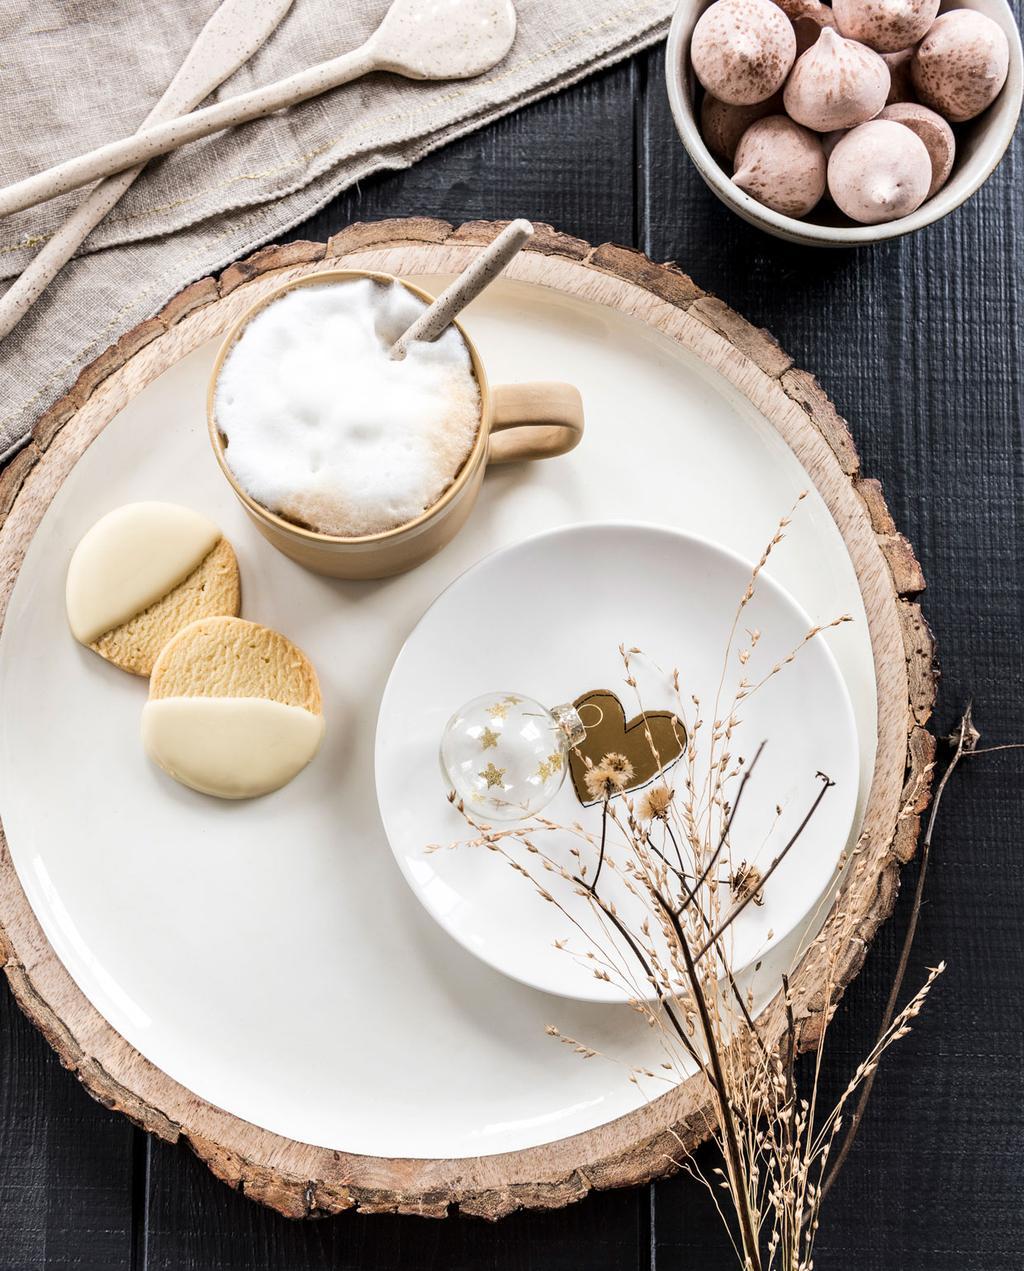 vtwonen 12-2019 | vtwonen feestcollectie najaar 2019 feestartikelen koffietafel